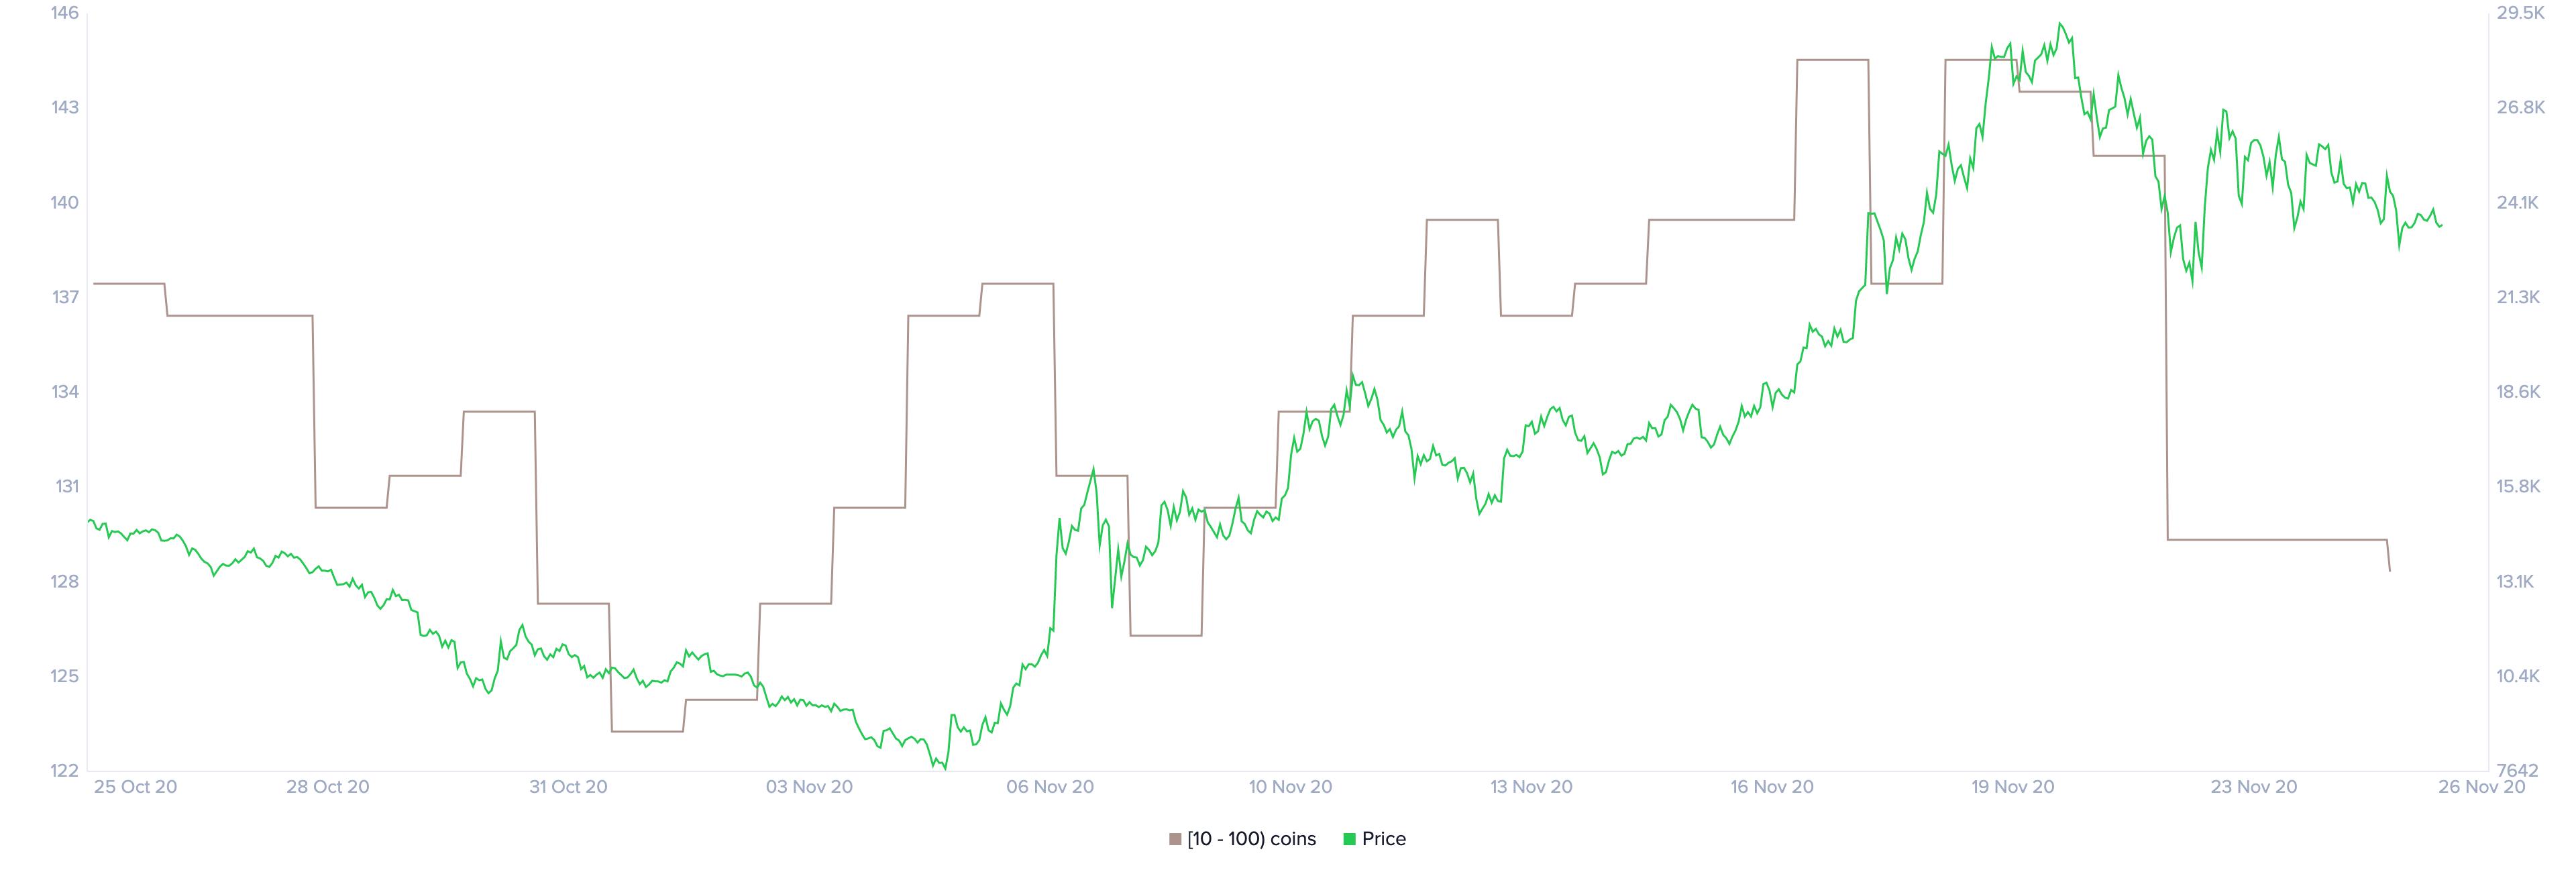 yfi price